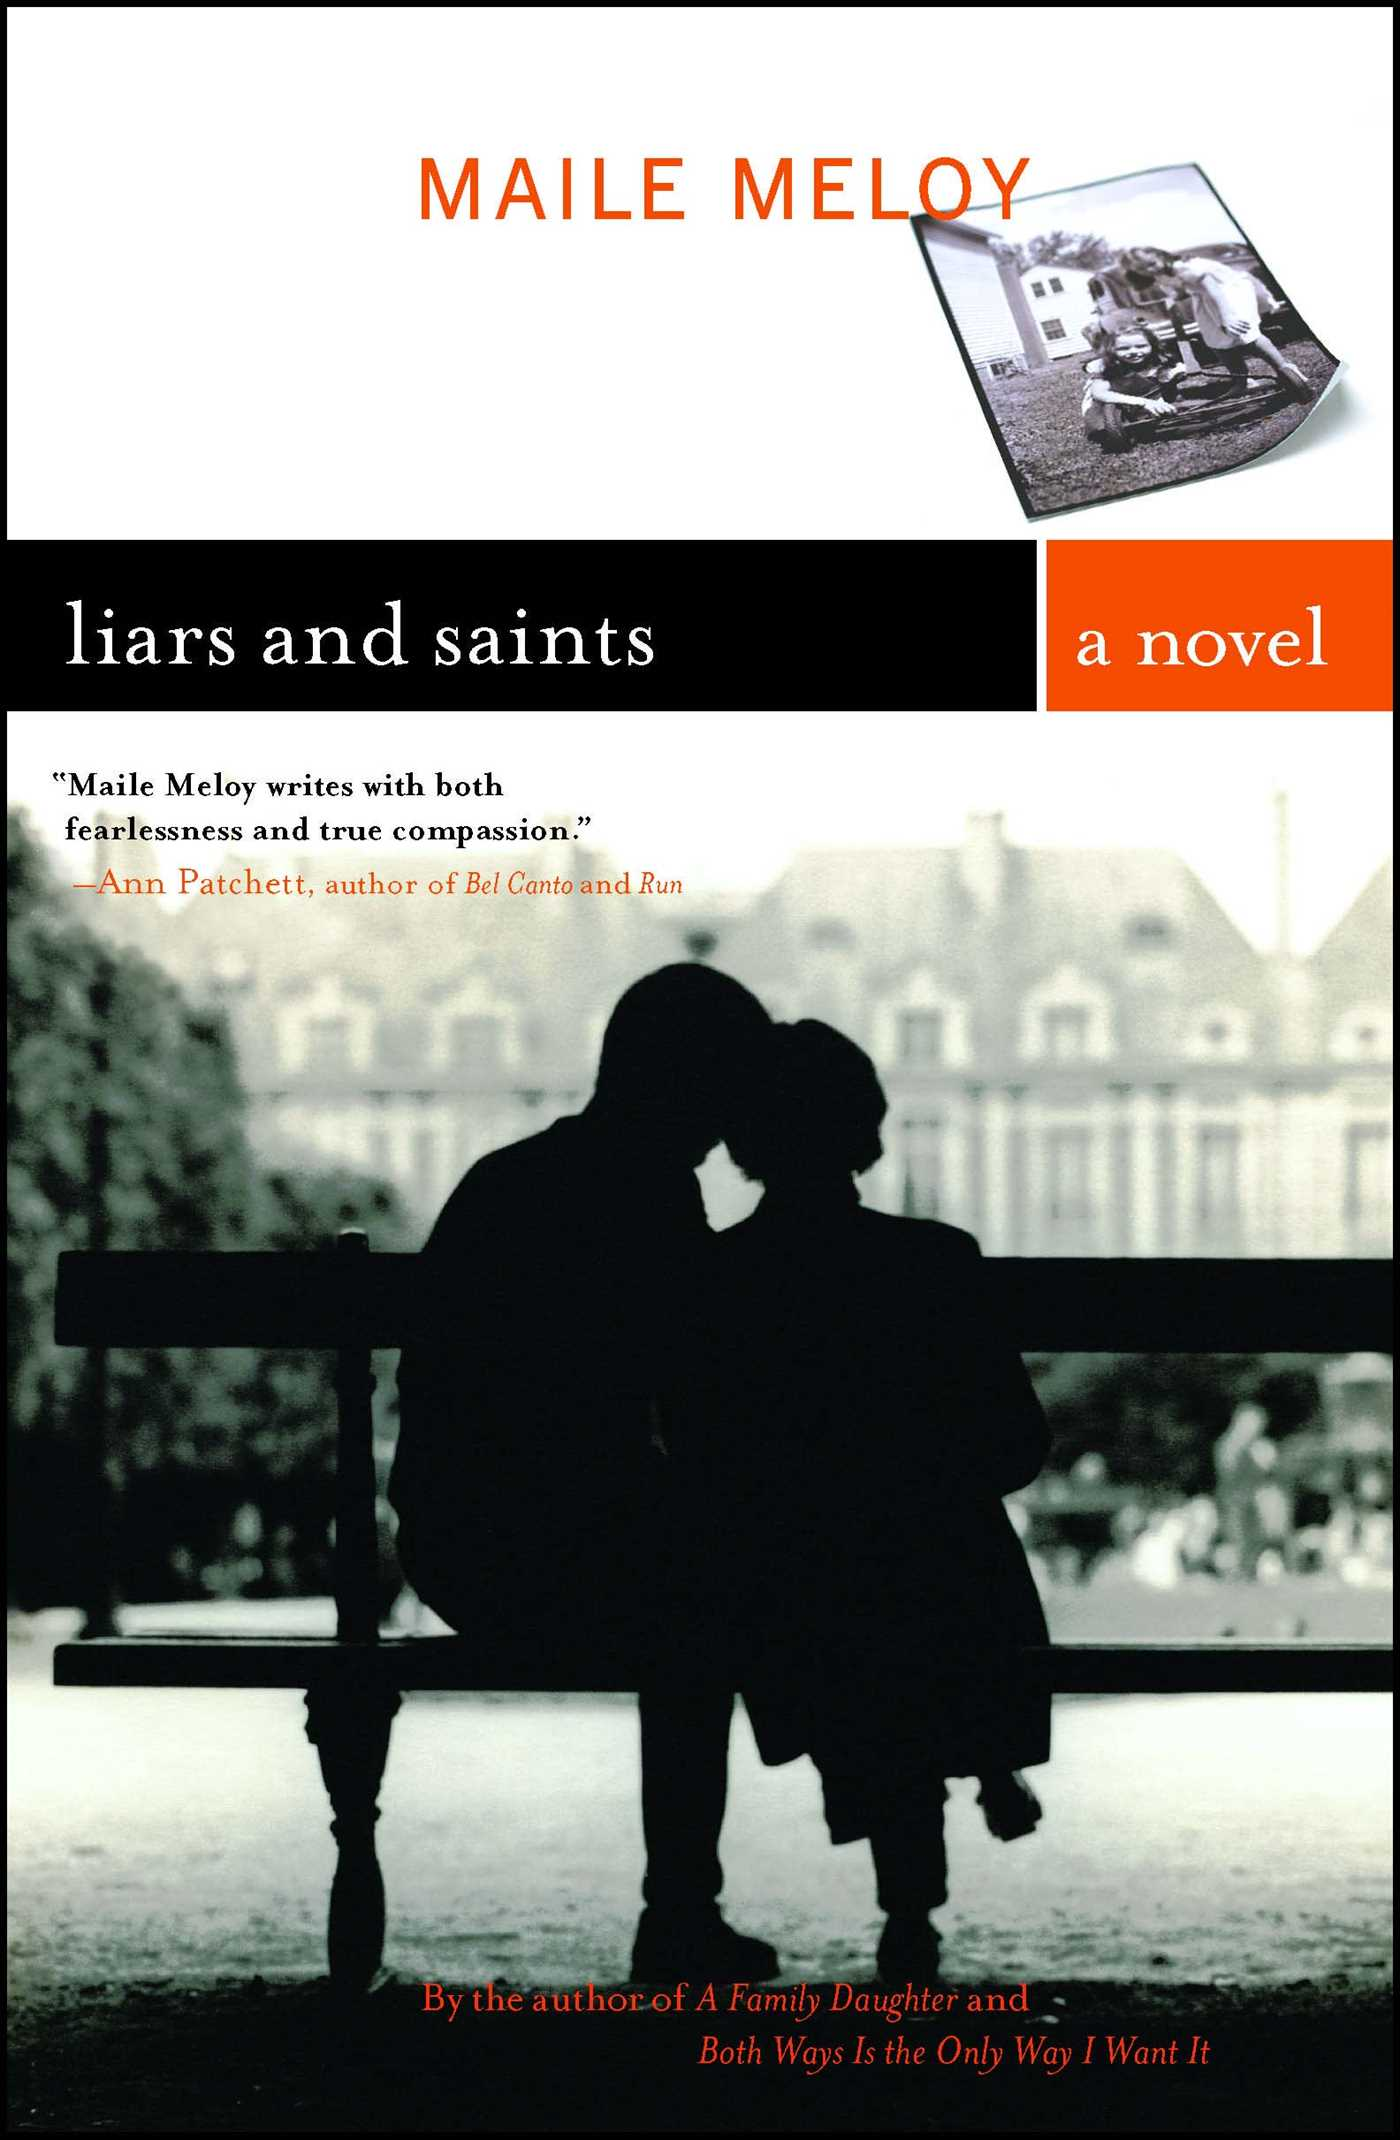 Liars and saints 9780743261982 hr